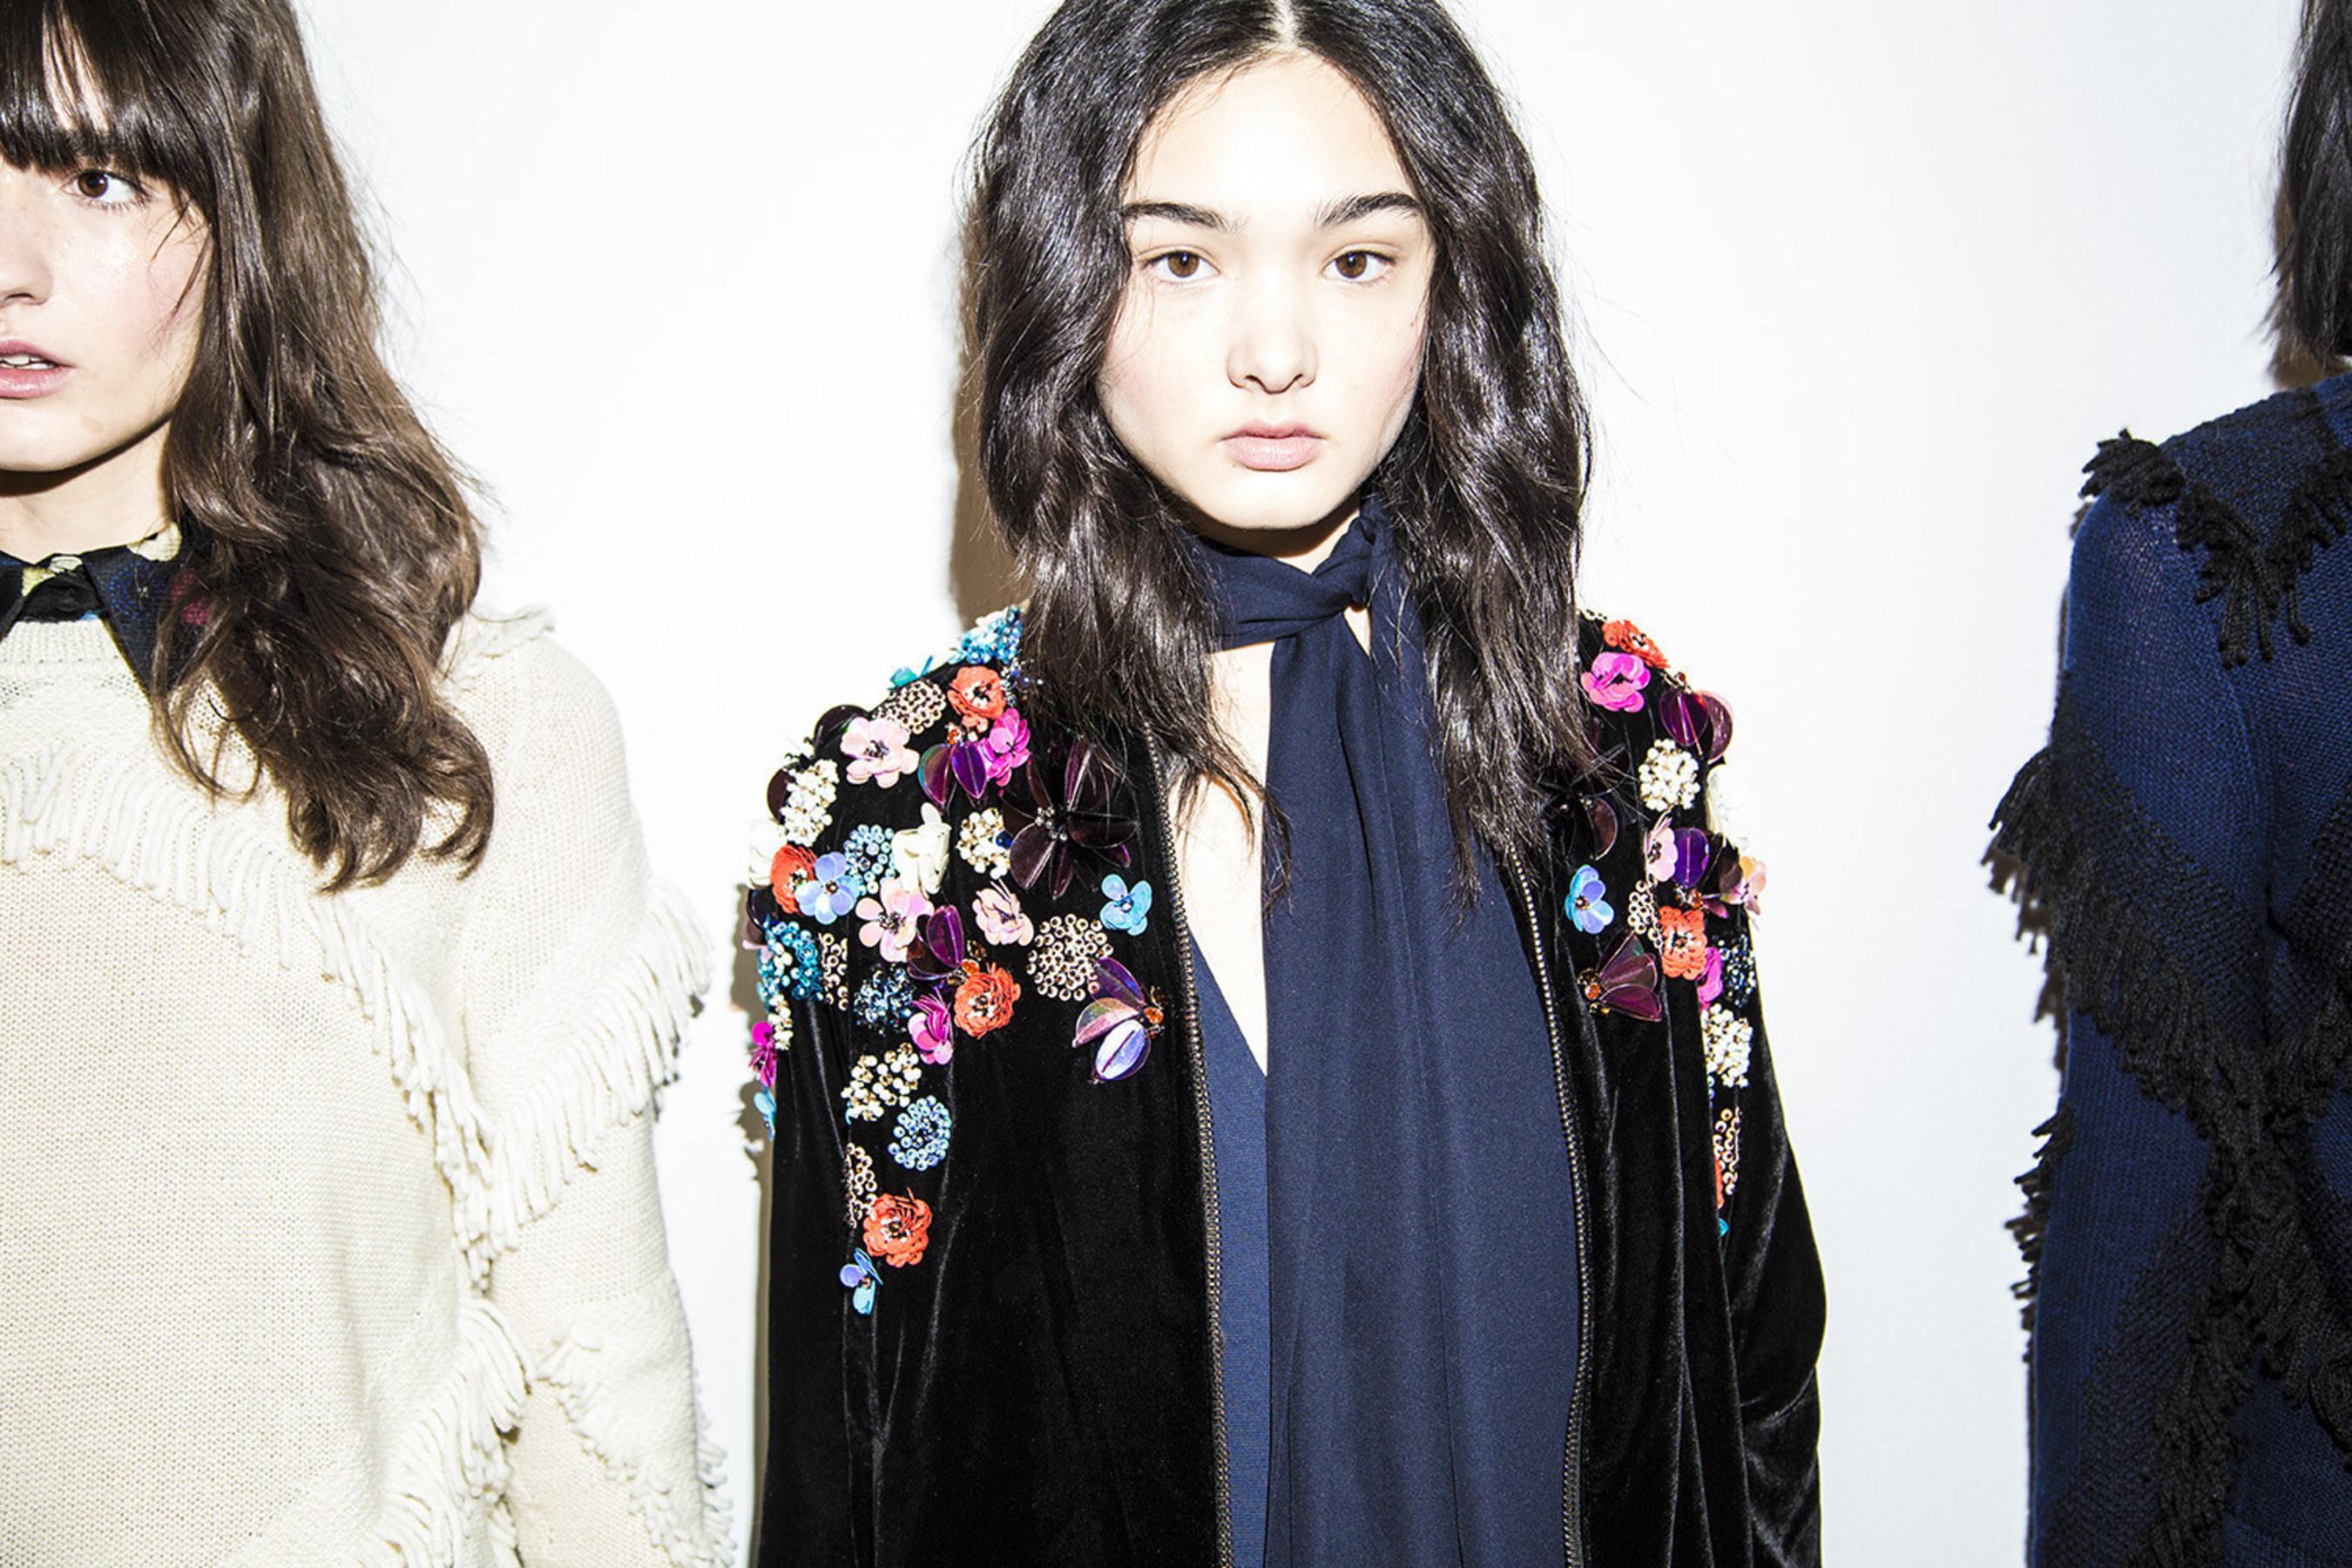 Over Half A Million Swarovski Crystals Hit The Runway During New York Fashion Week